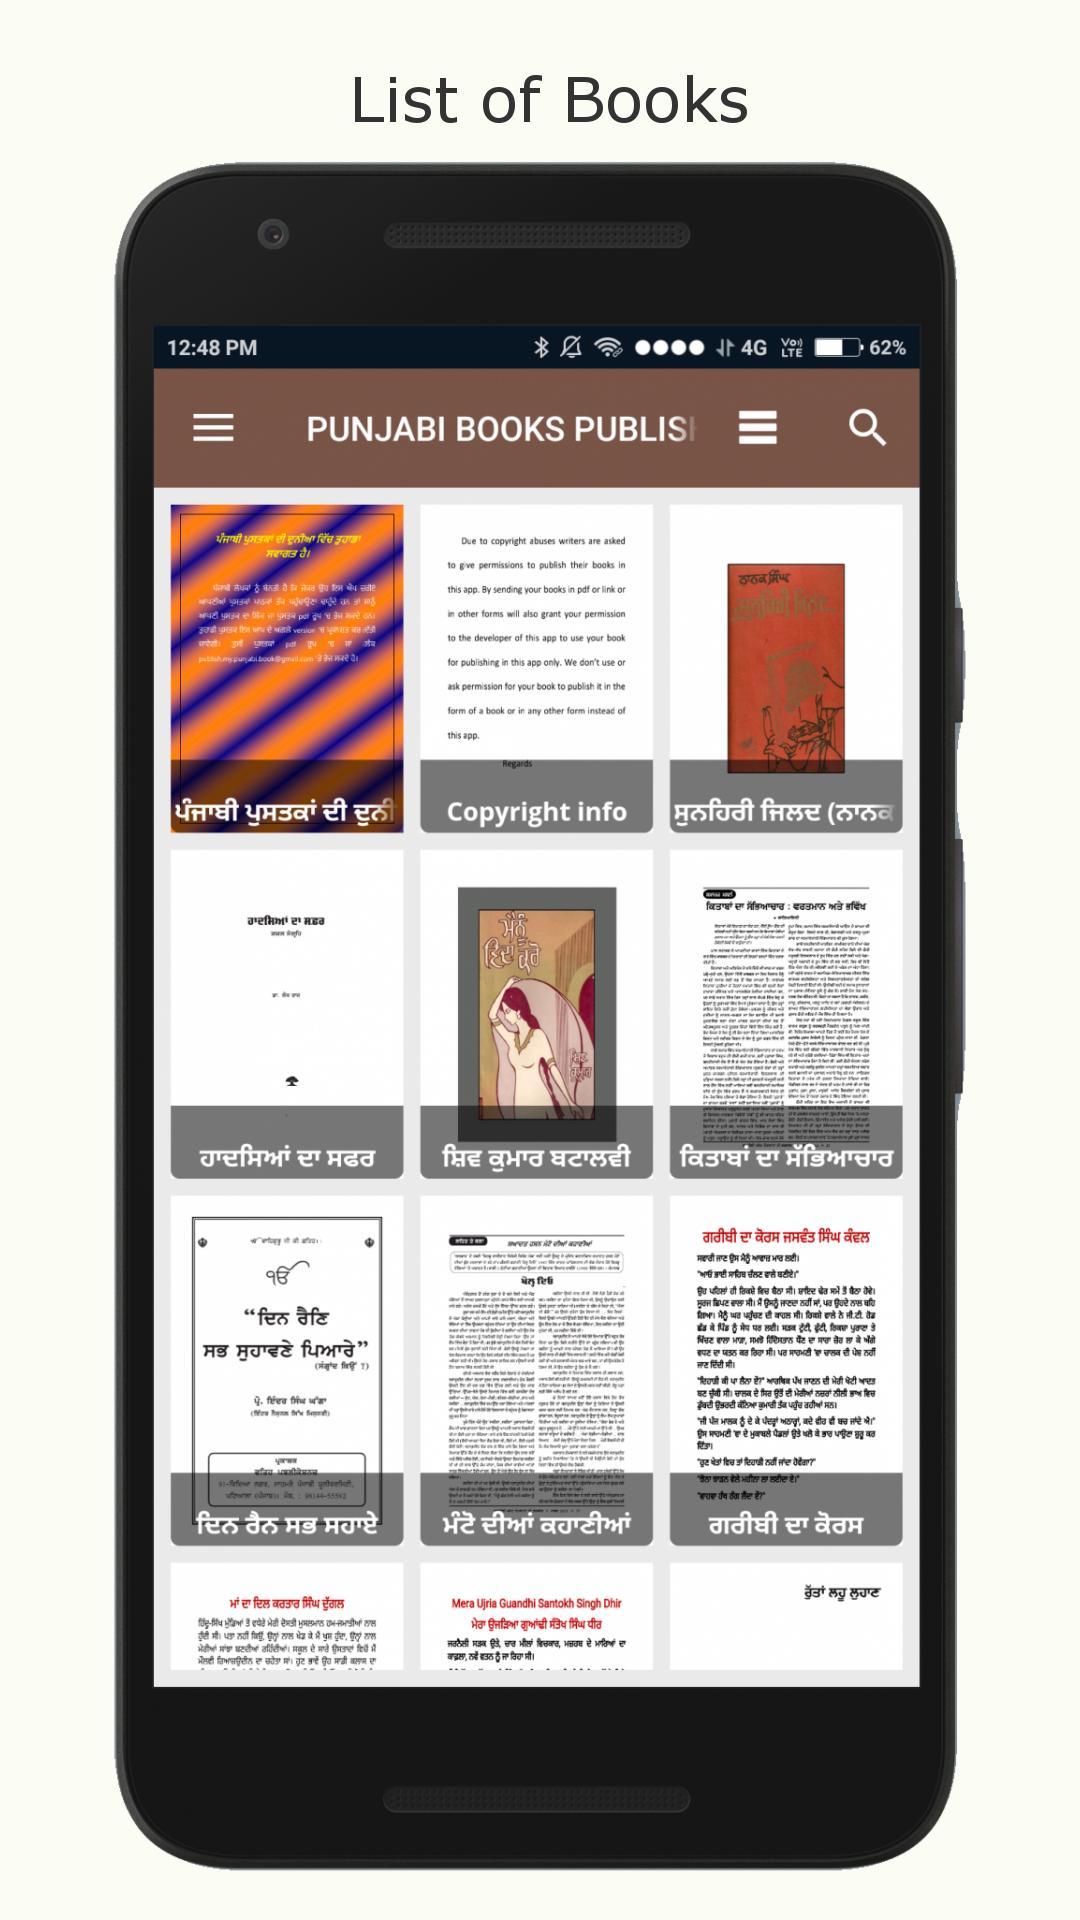 Punjabi Books for Android - APK Download